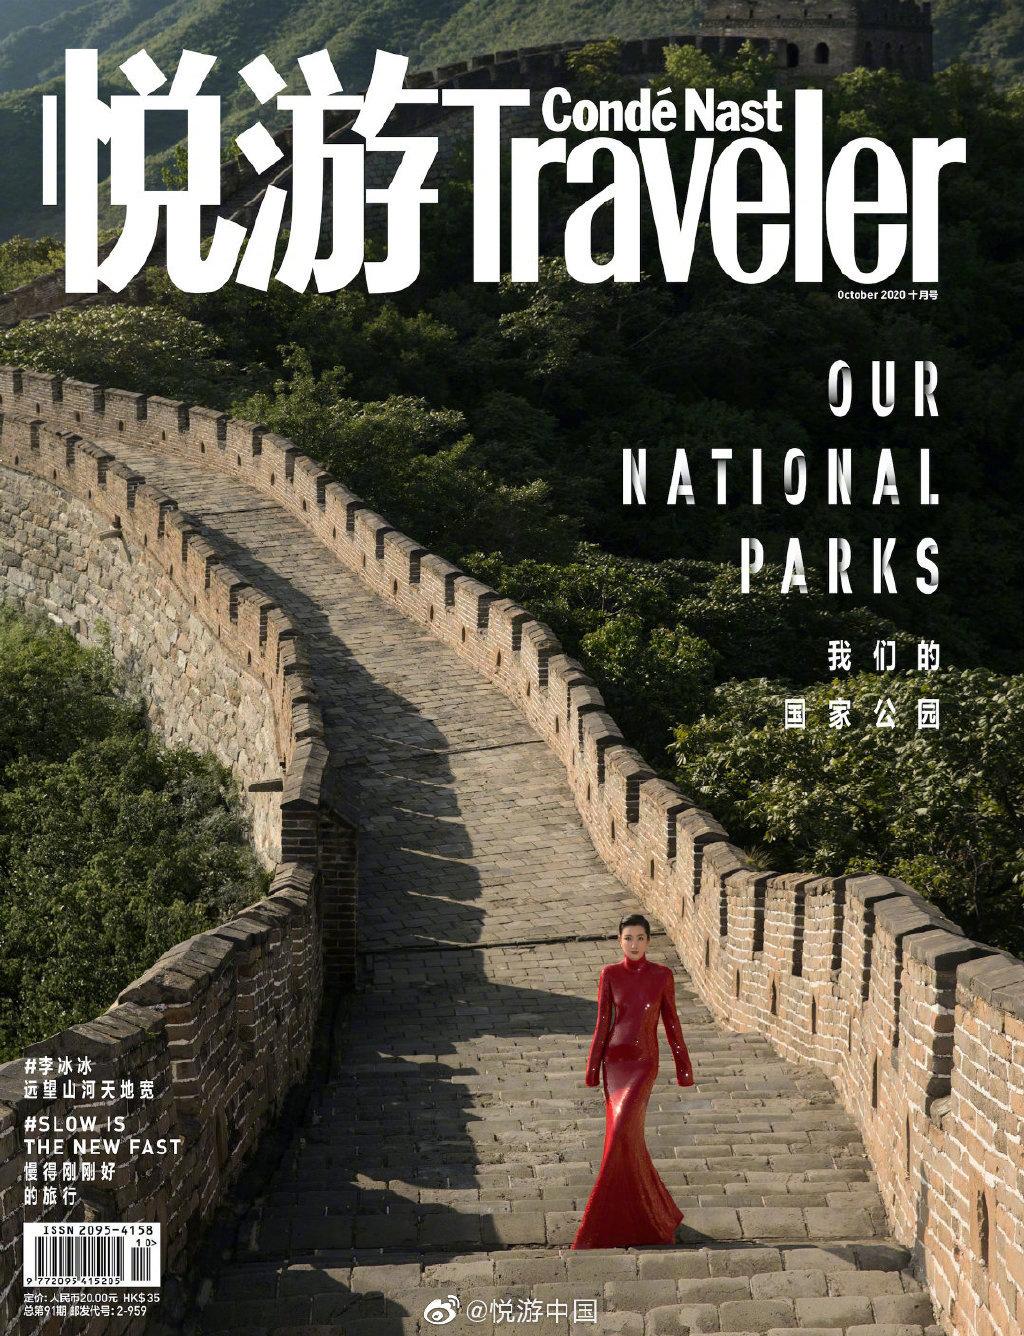 allbet手机版下载:李冰冰登长城拍摄大片 红裙加身显身体气场全开 第1张